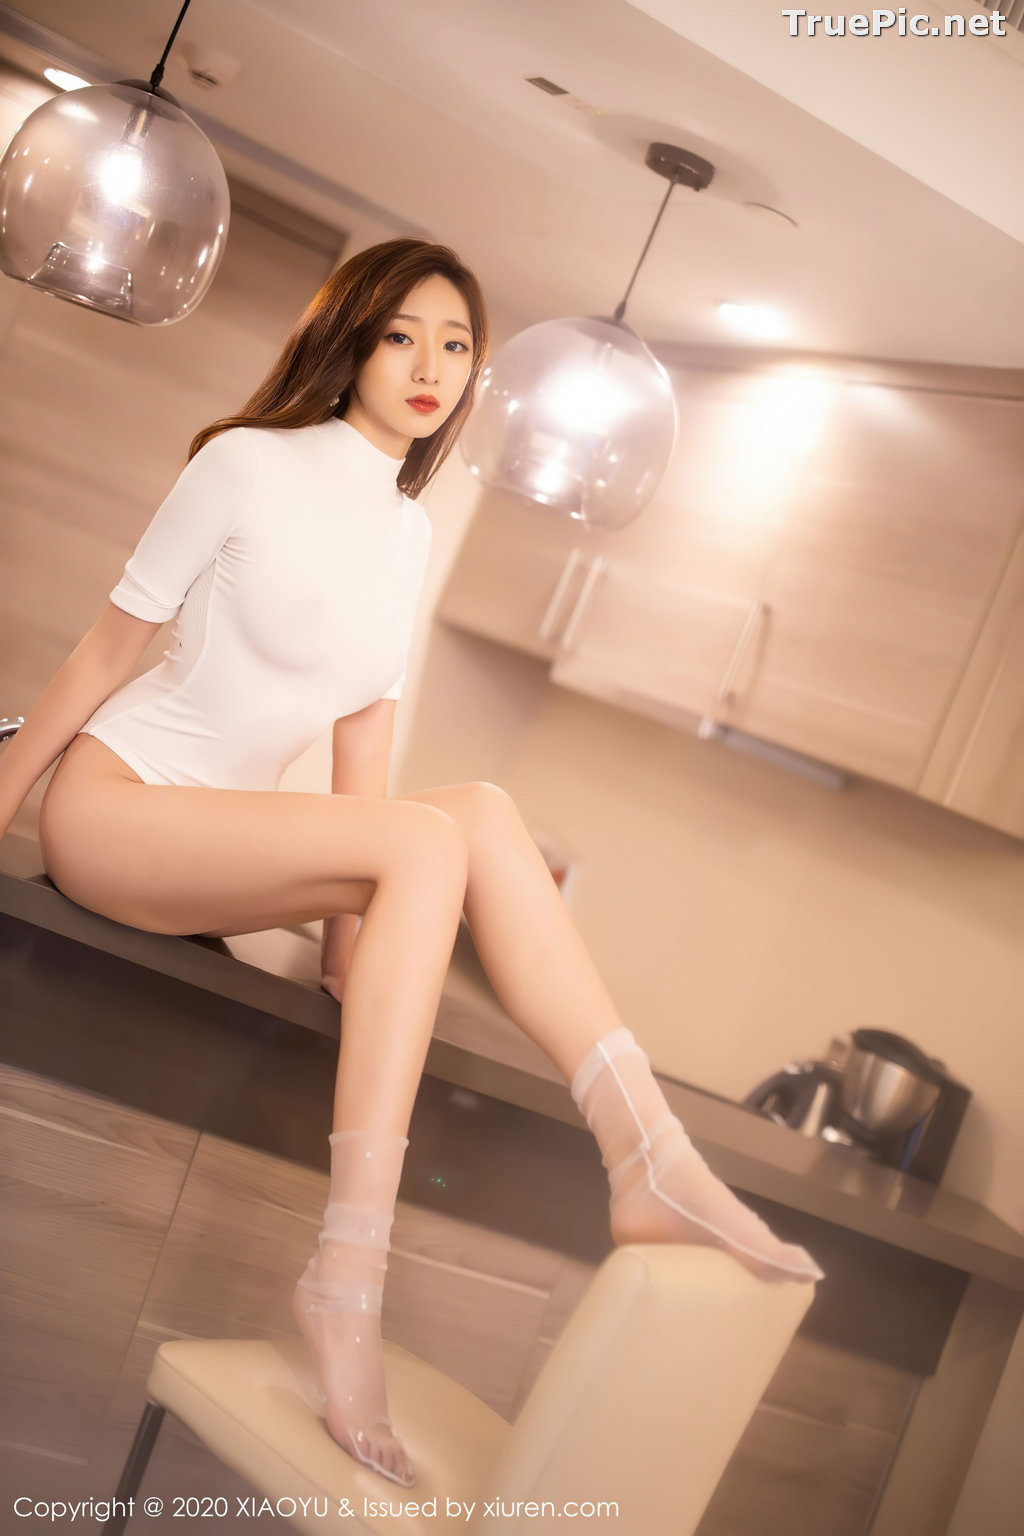 Image XiaoYu Vol.389 - Chinese Model - 安琪 Yee - Beautiful In White - TruePic.net - Picture-10